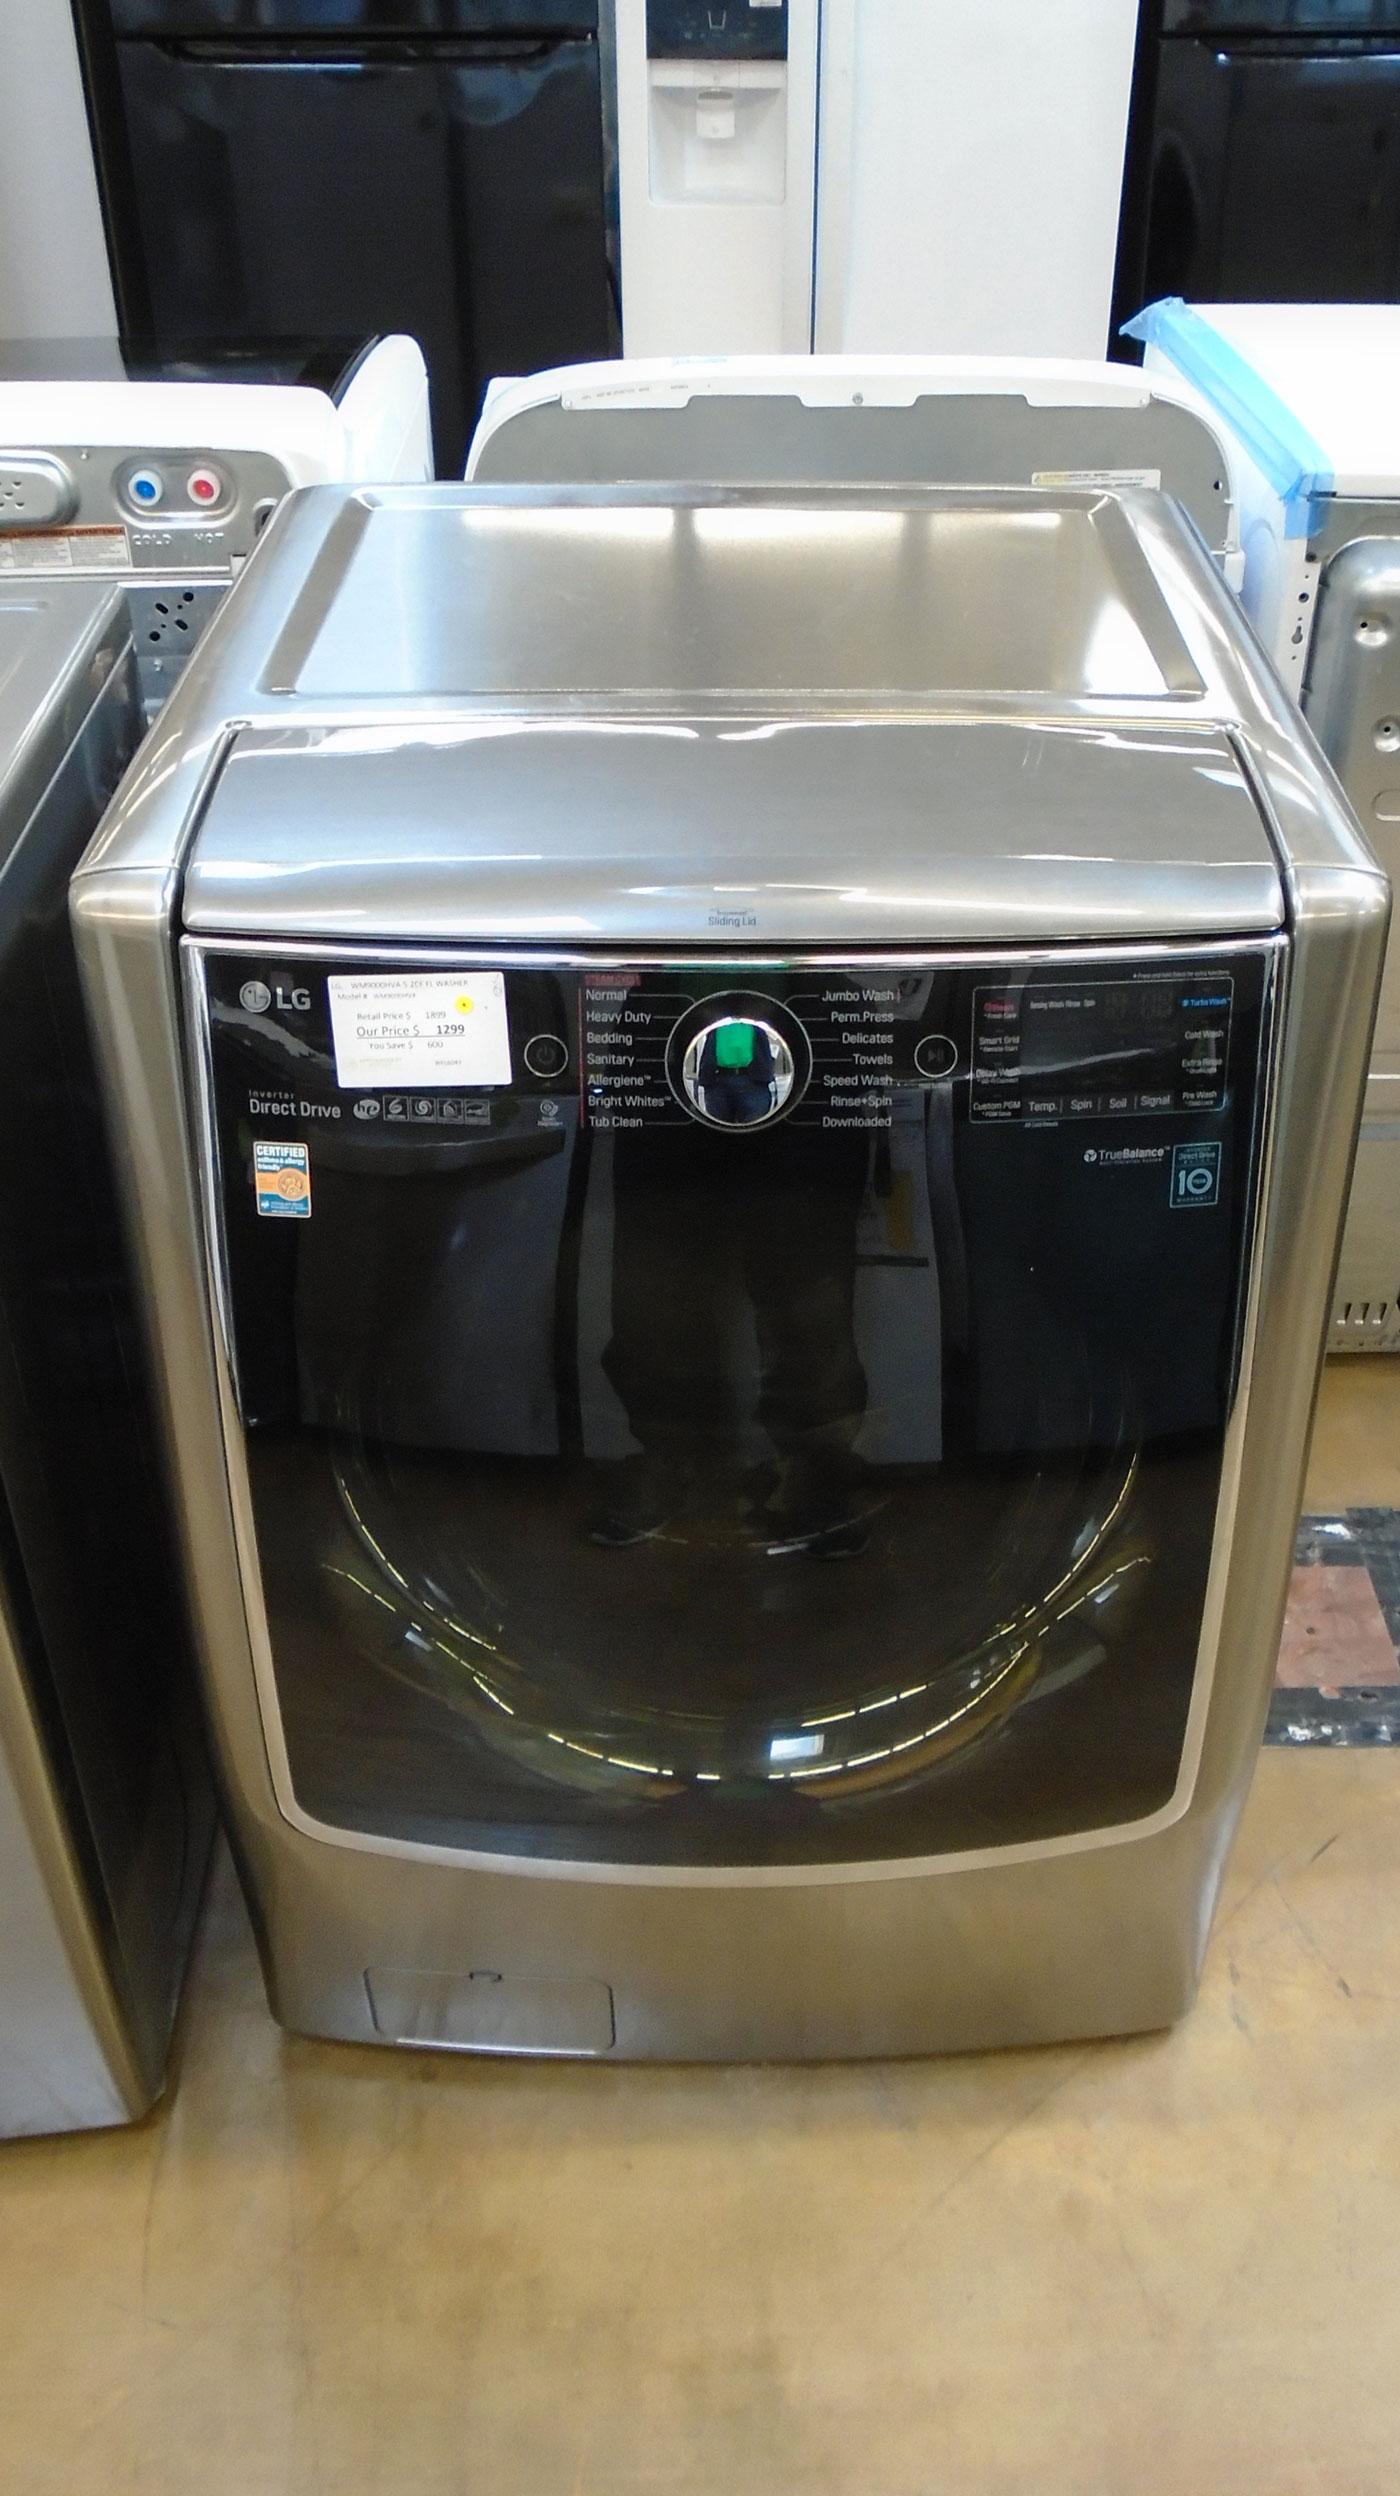 "29"" LG WM9000HVA 5.2 cu.ft. Front Load Washer"